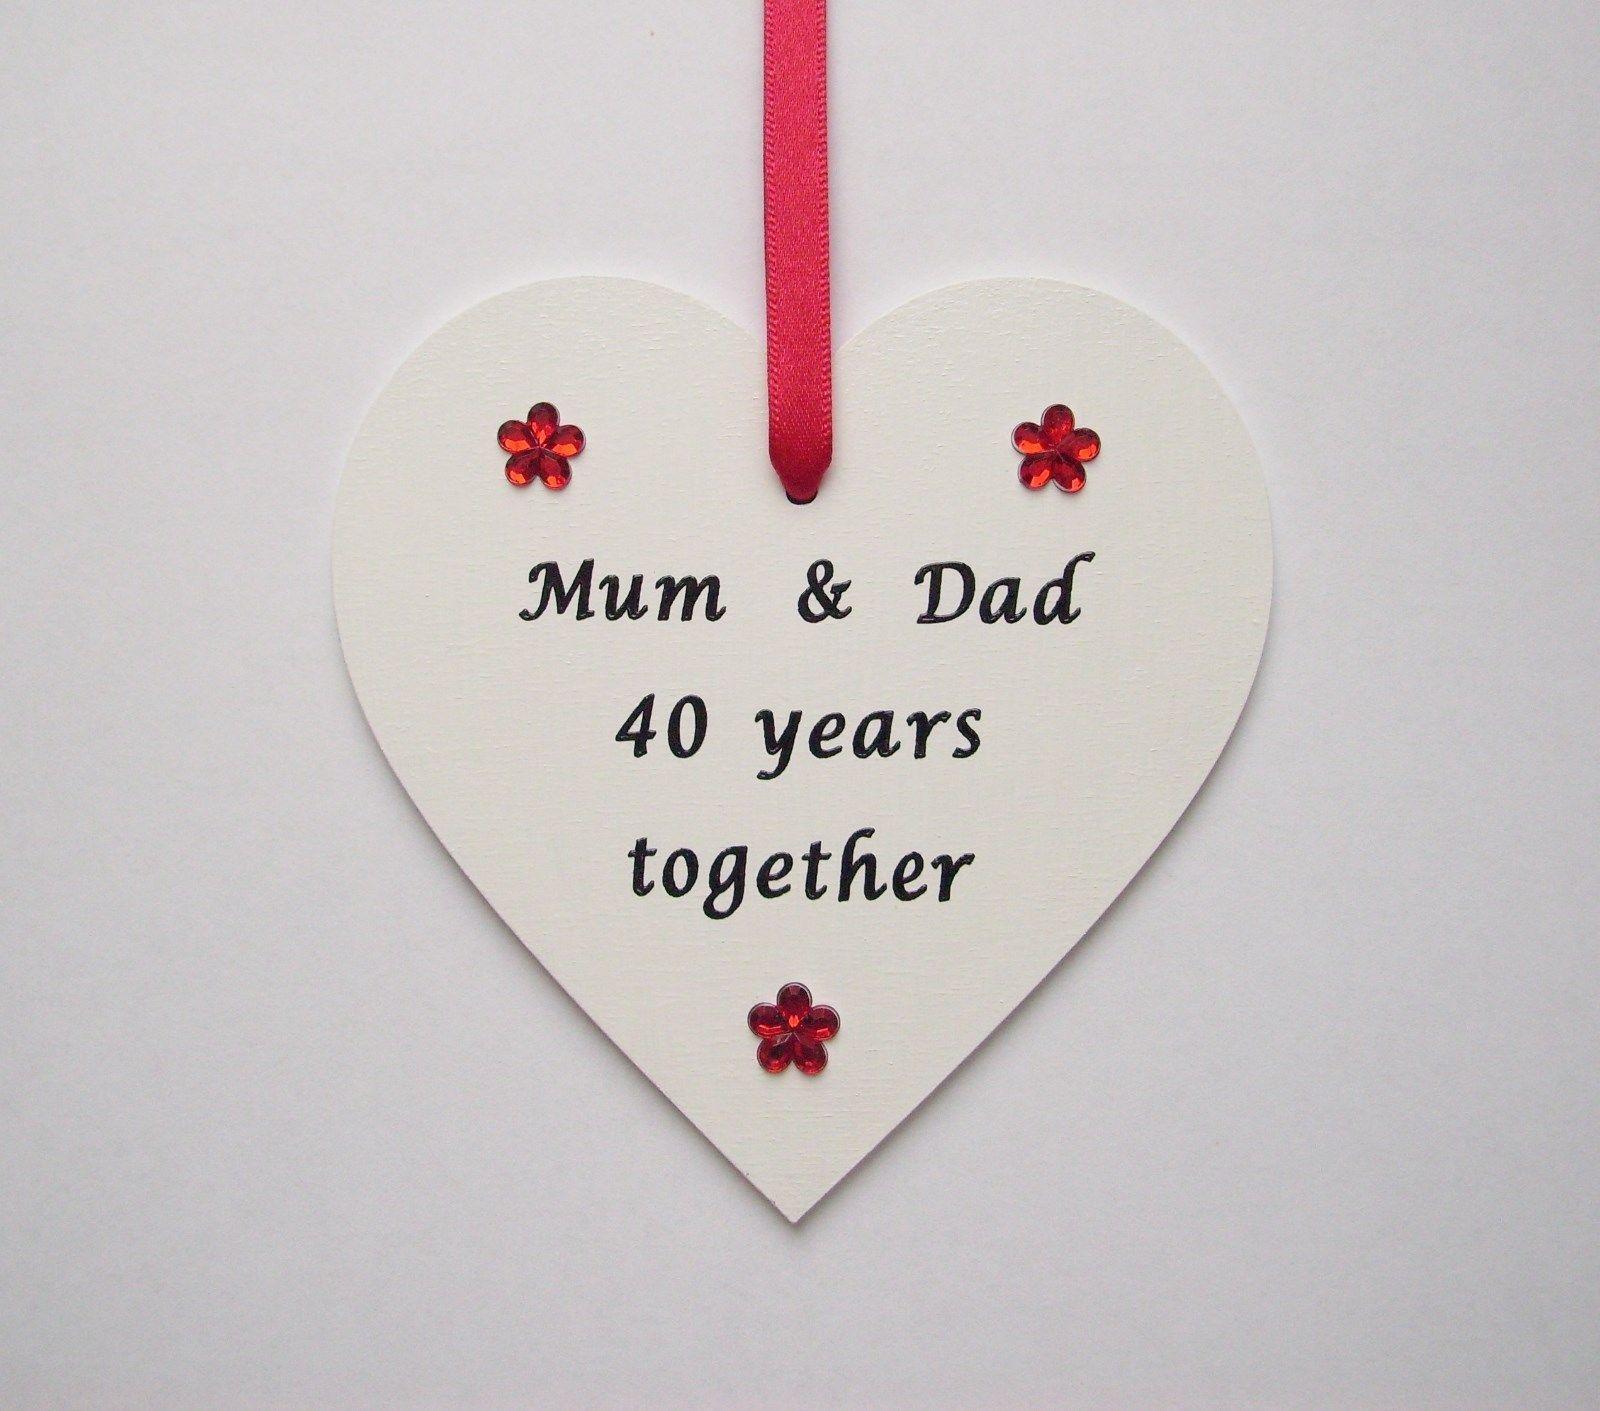 Personalsied Ruby Wedding Anniversary Wooden Keepsake Plaque Gift